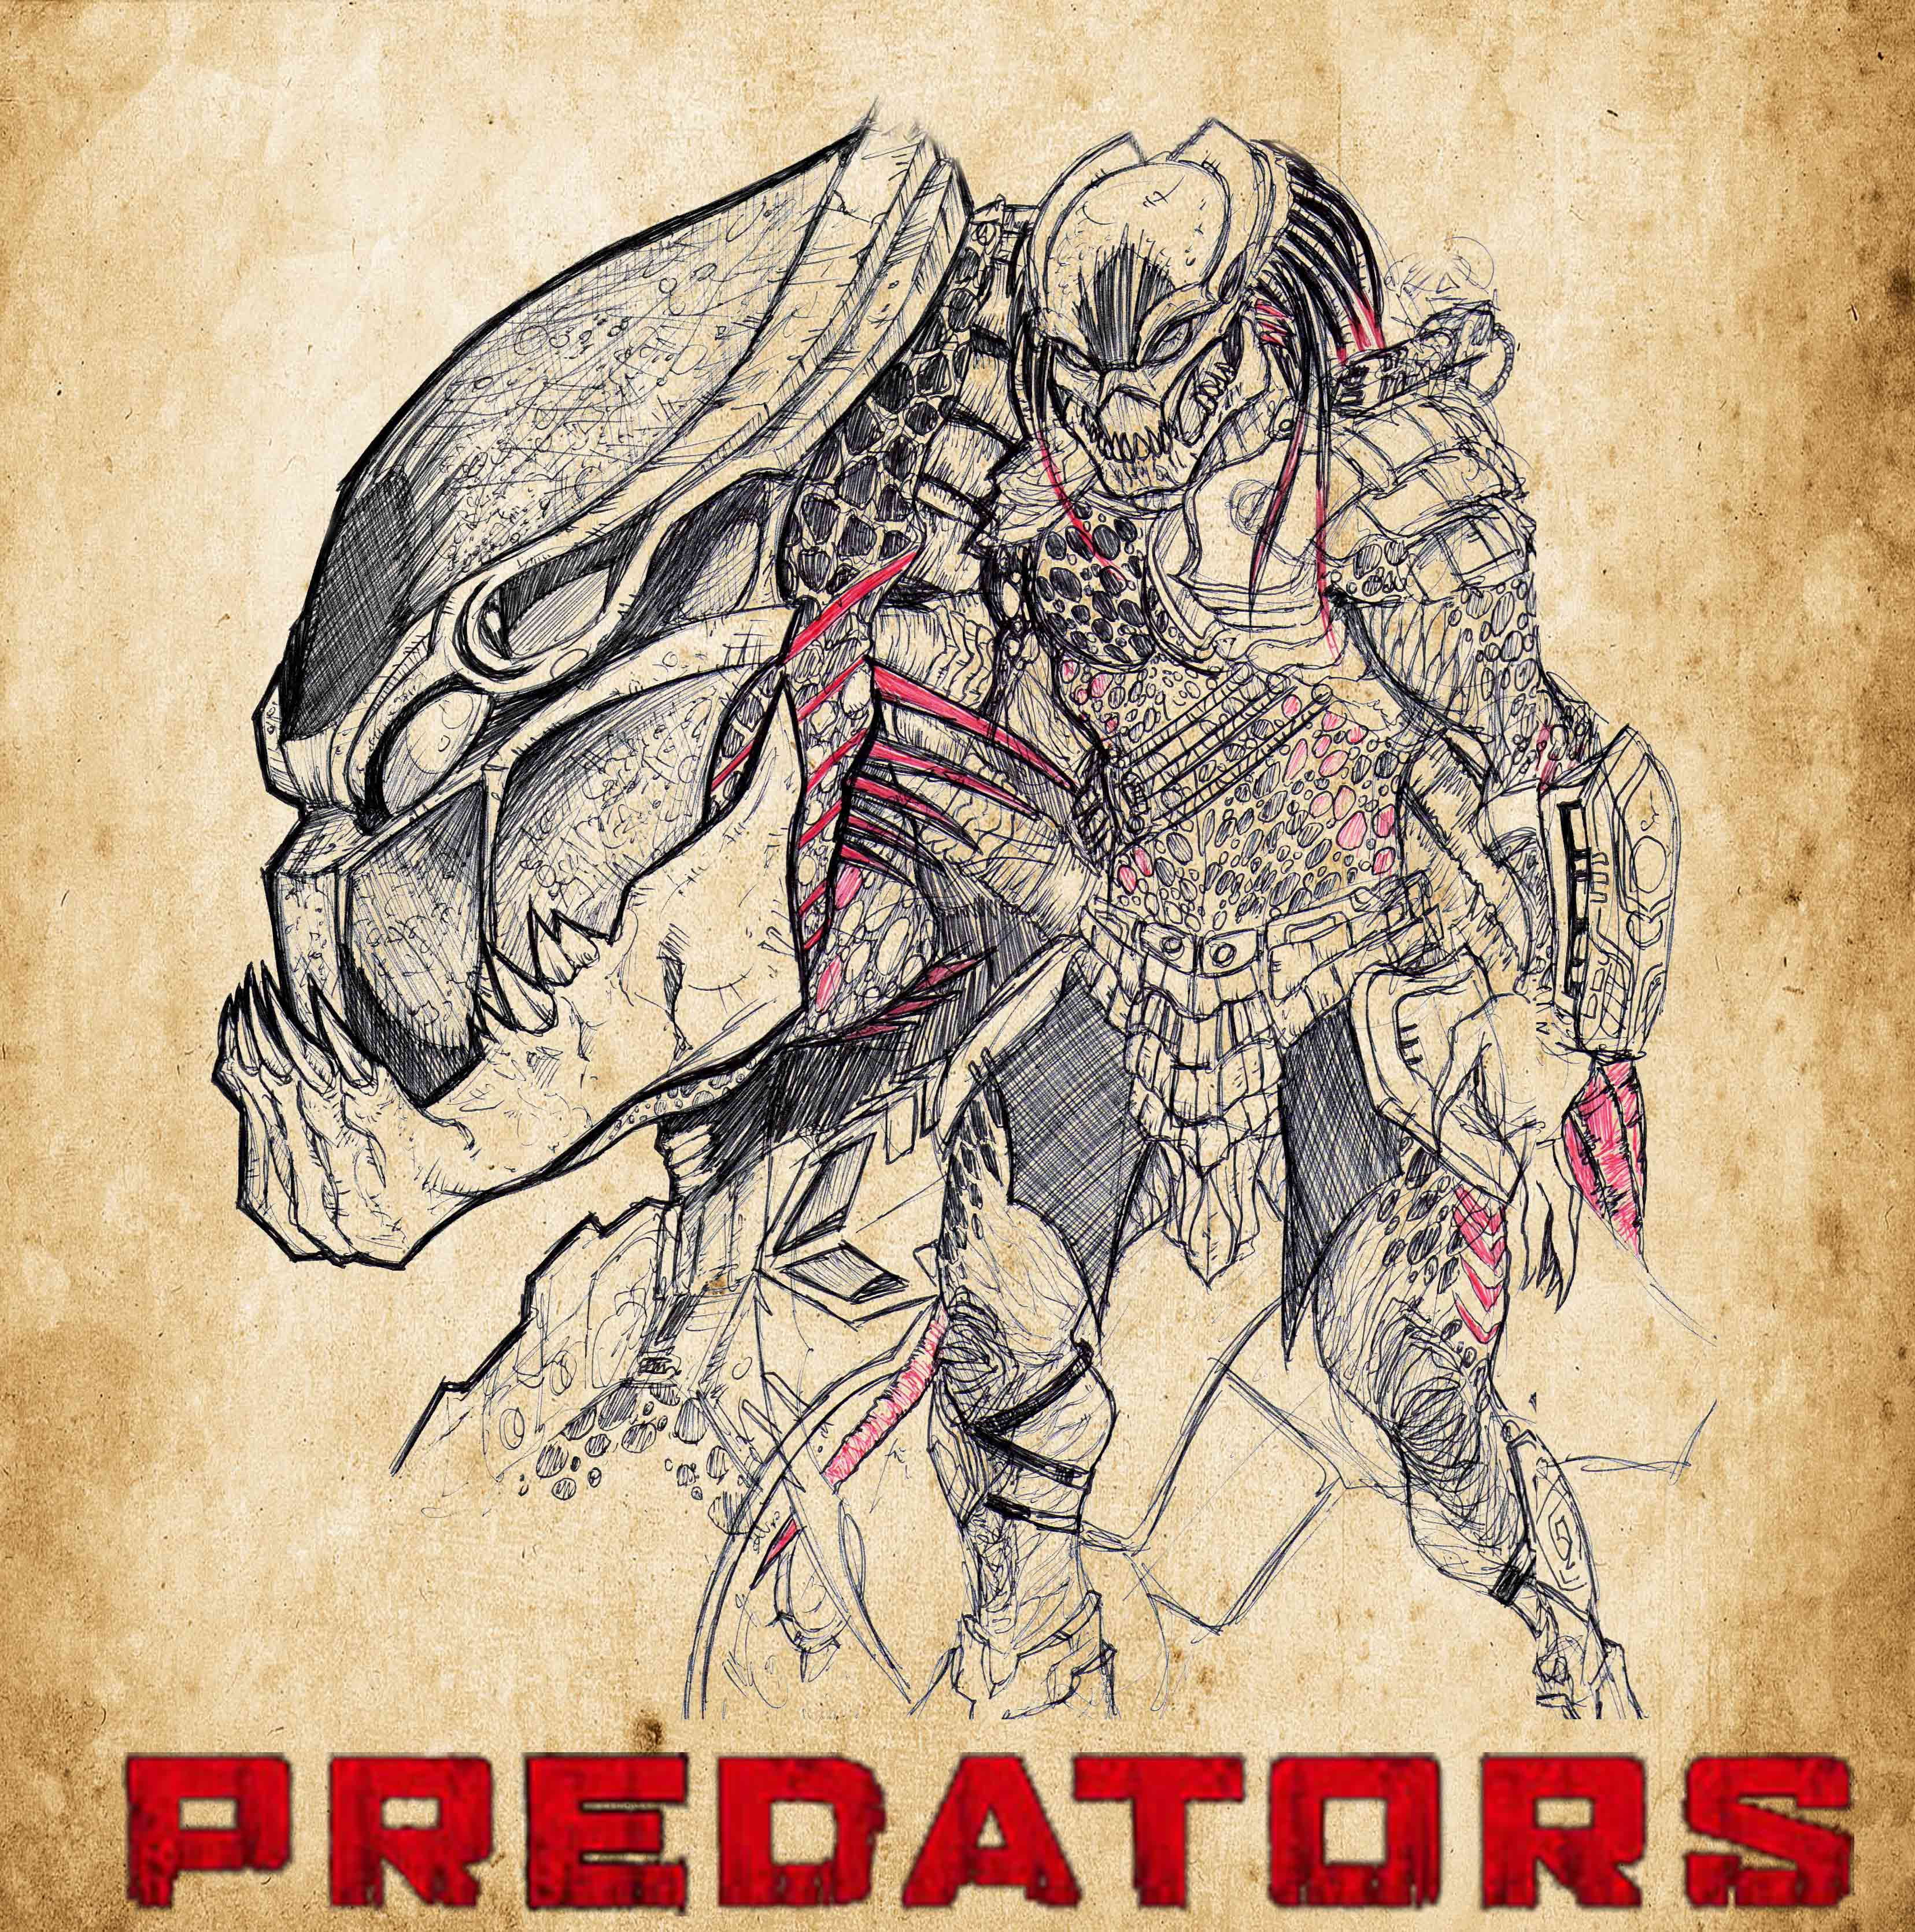 Drawn predator berserker On vandalocomics Bender18 BERSERKER berserkerpredator